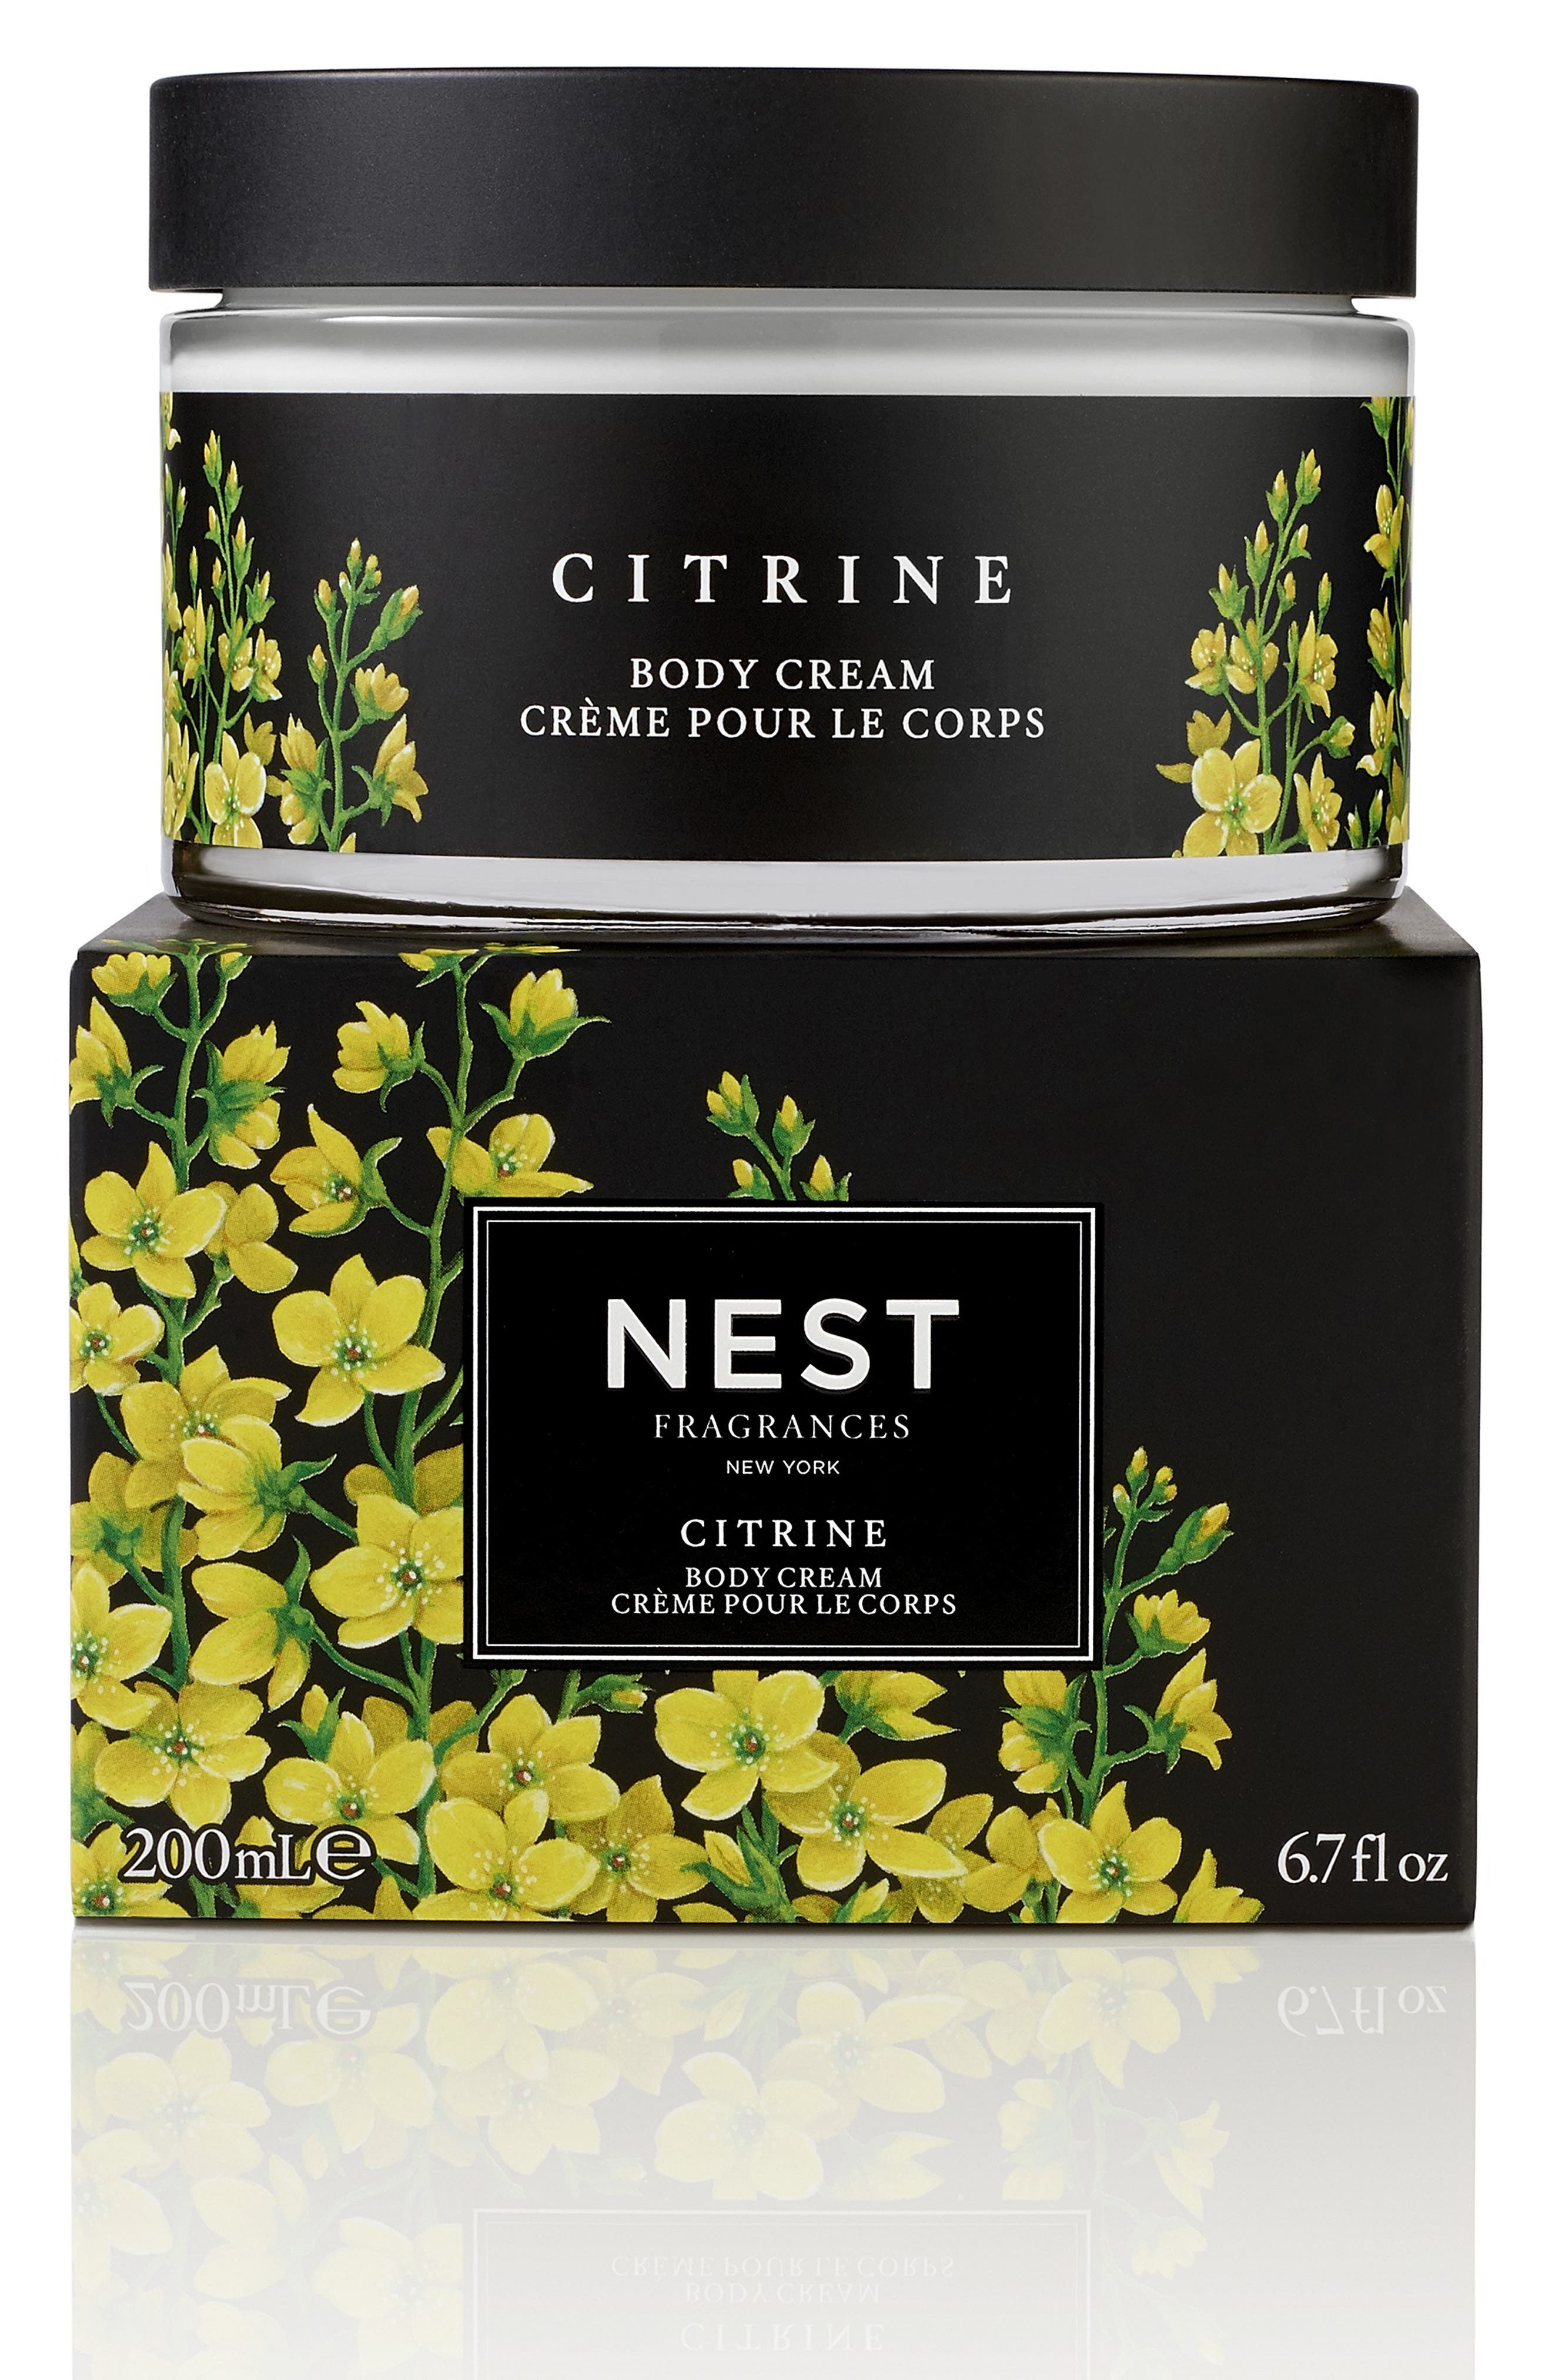 Image of NEST Fragrances Citrine Body Cream